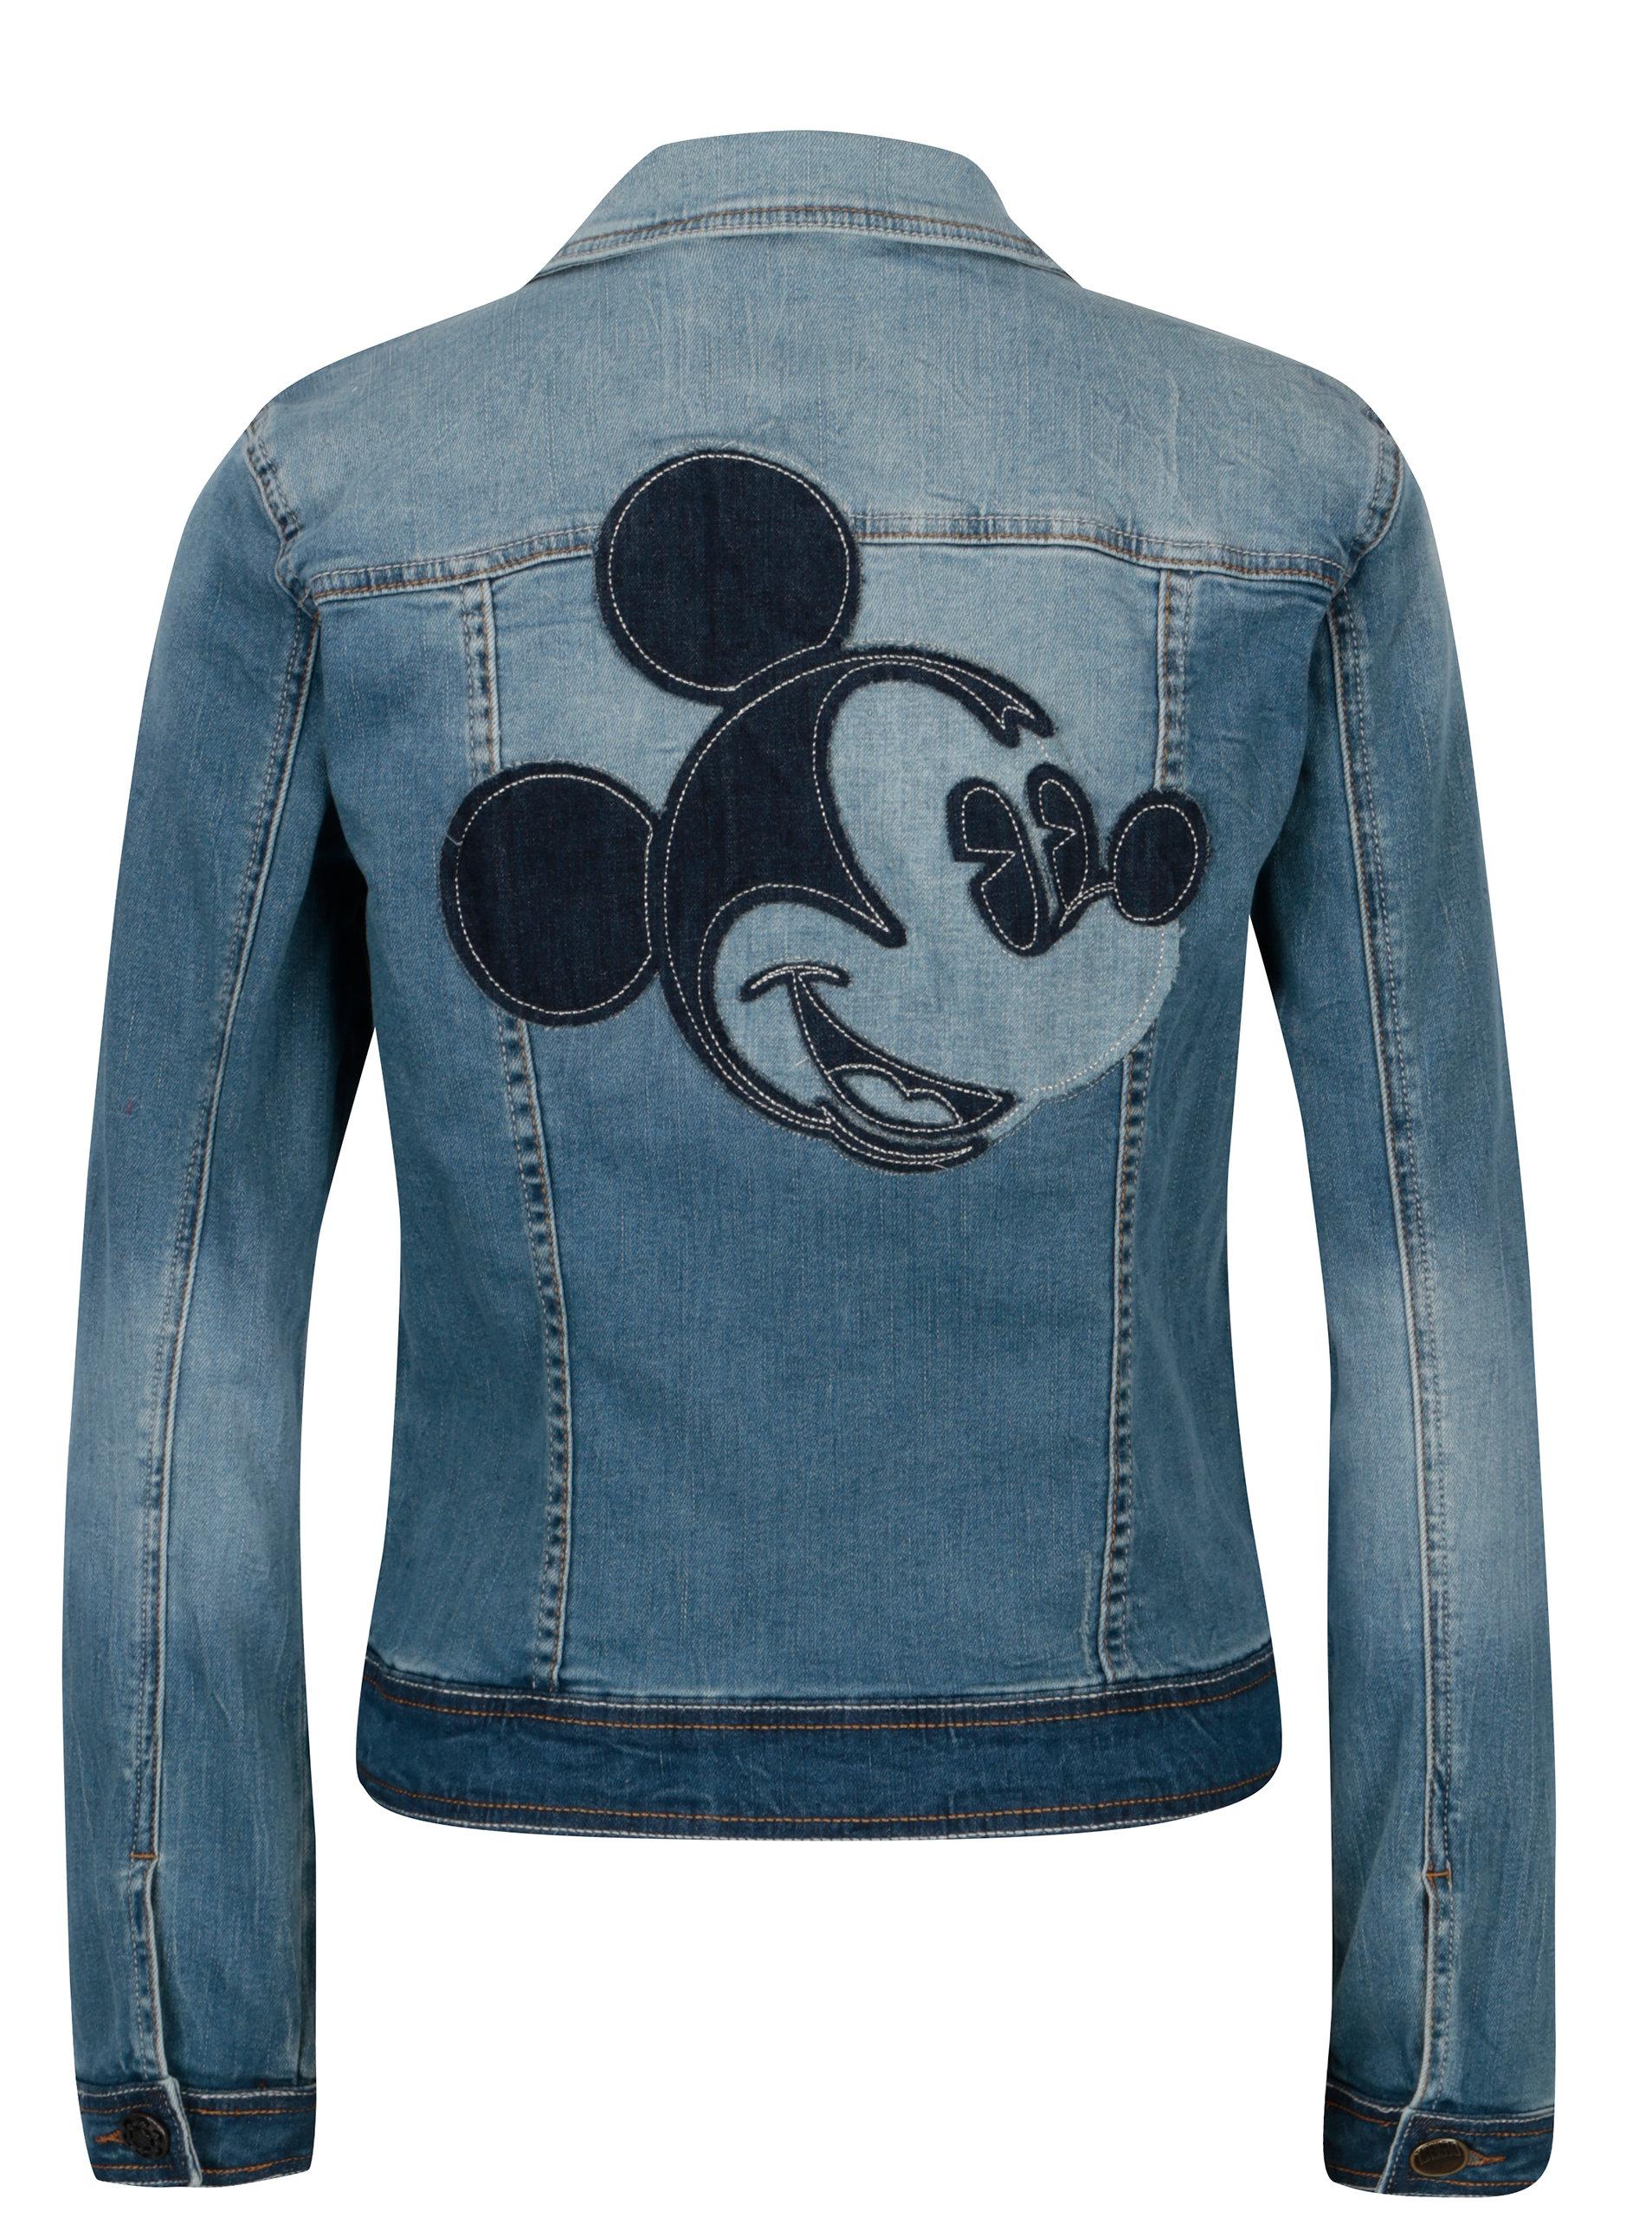 Modrá džínová bunda s nášivkou na zádech Desigual Maria Goeppert ... b8f85a59c7b